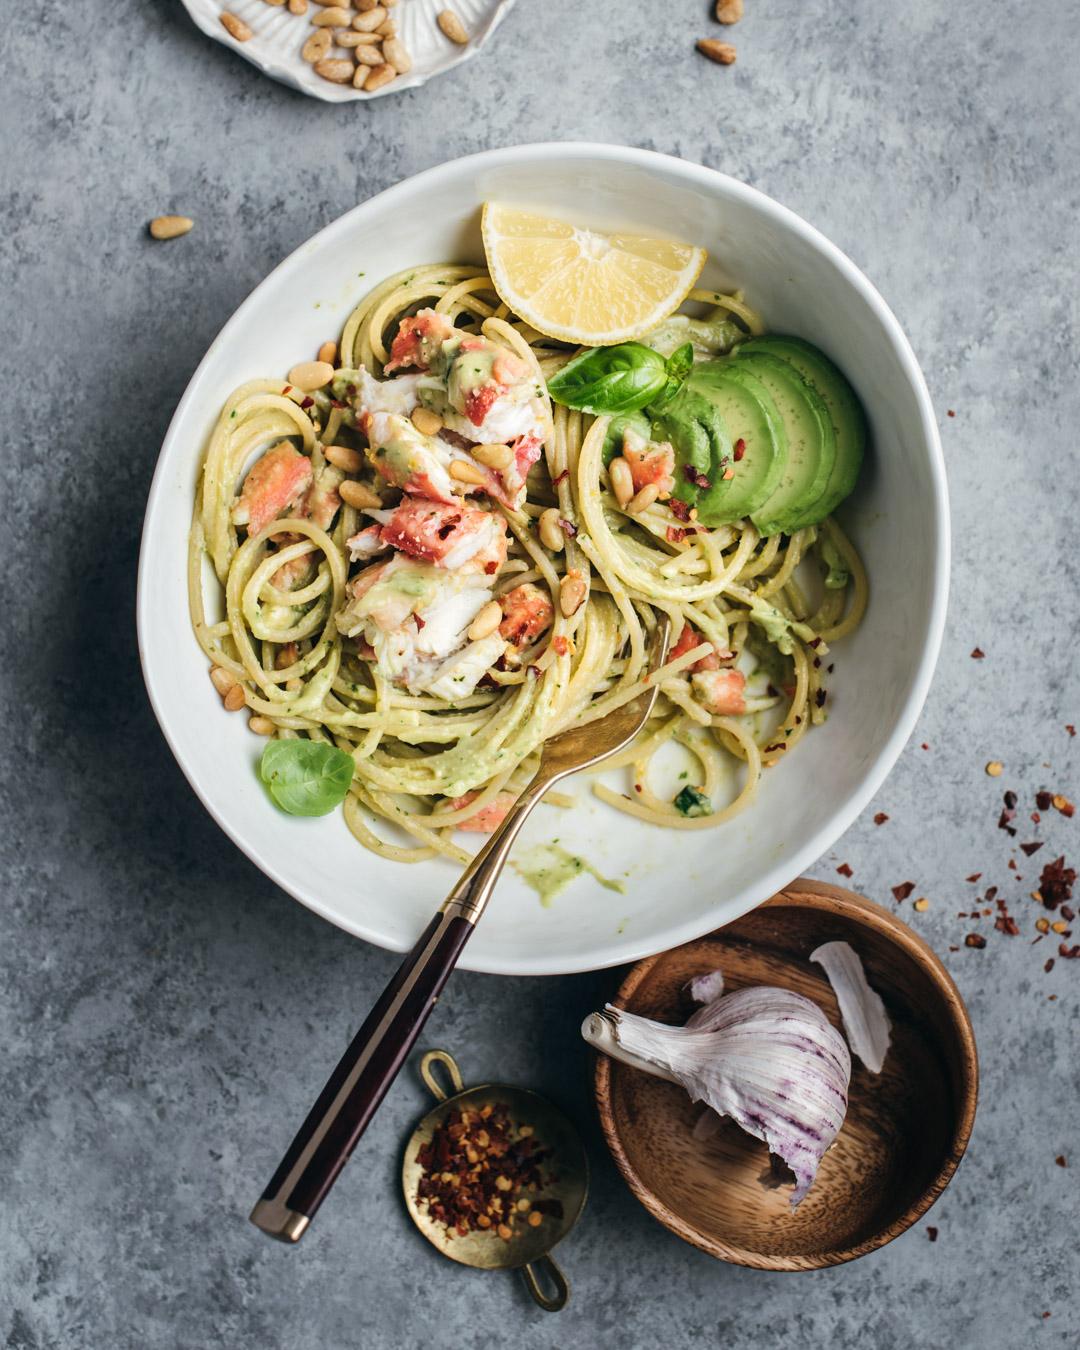 king crab avocado pesto pasta petrossian-9982-2.jpg